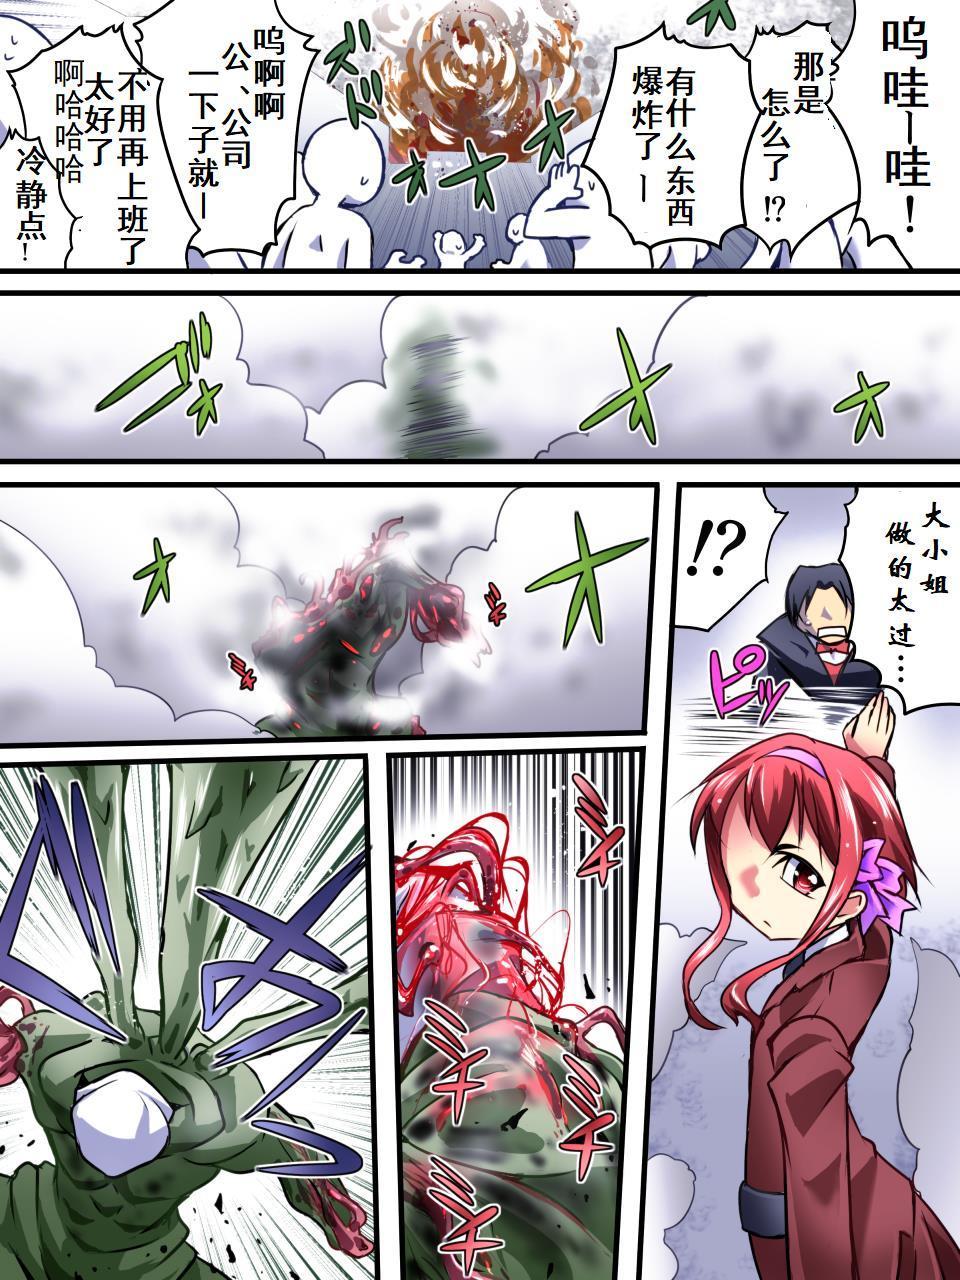 [Atelier Hachifukuan] Superheroine Yuukai Ryoujoku III - Superheroine in Distress [Chrome Rose Bell]   凌辱诱拐3 [Chinese] [有条色狼汉化] 6